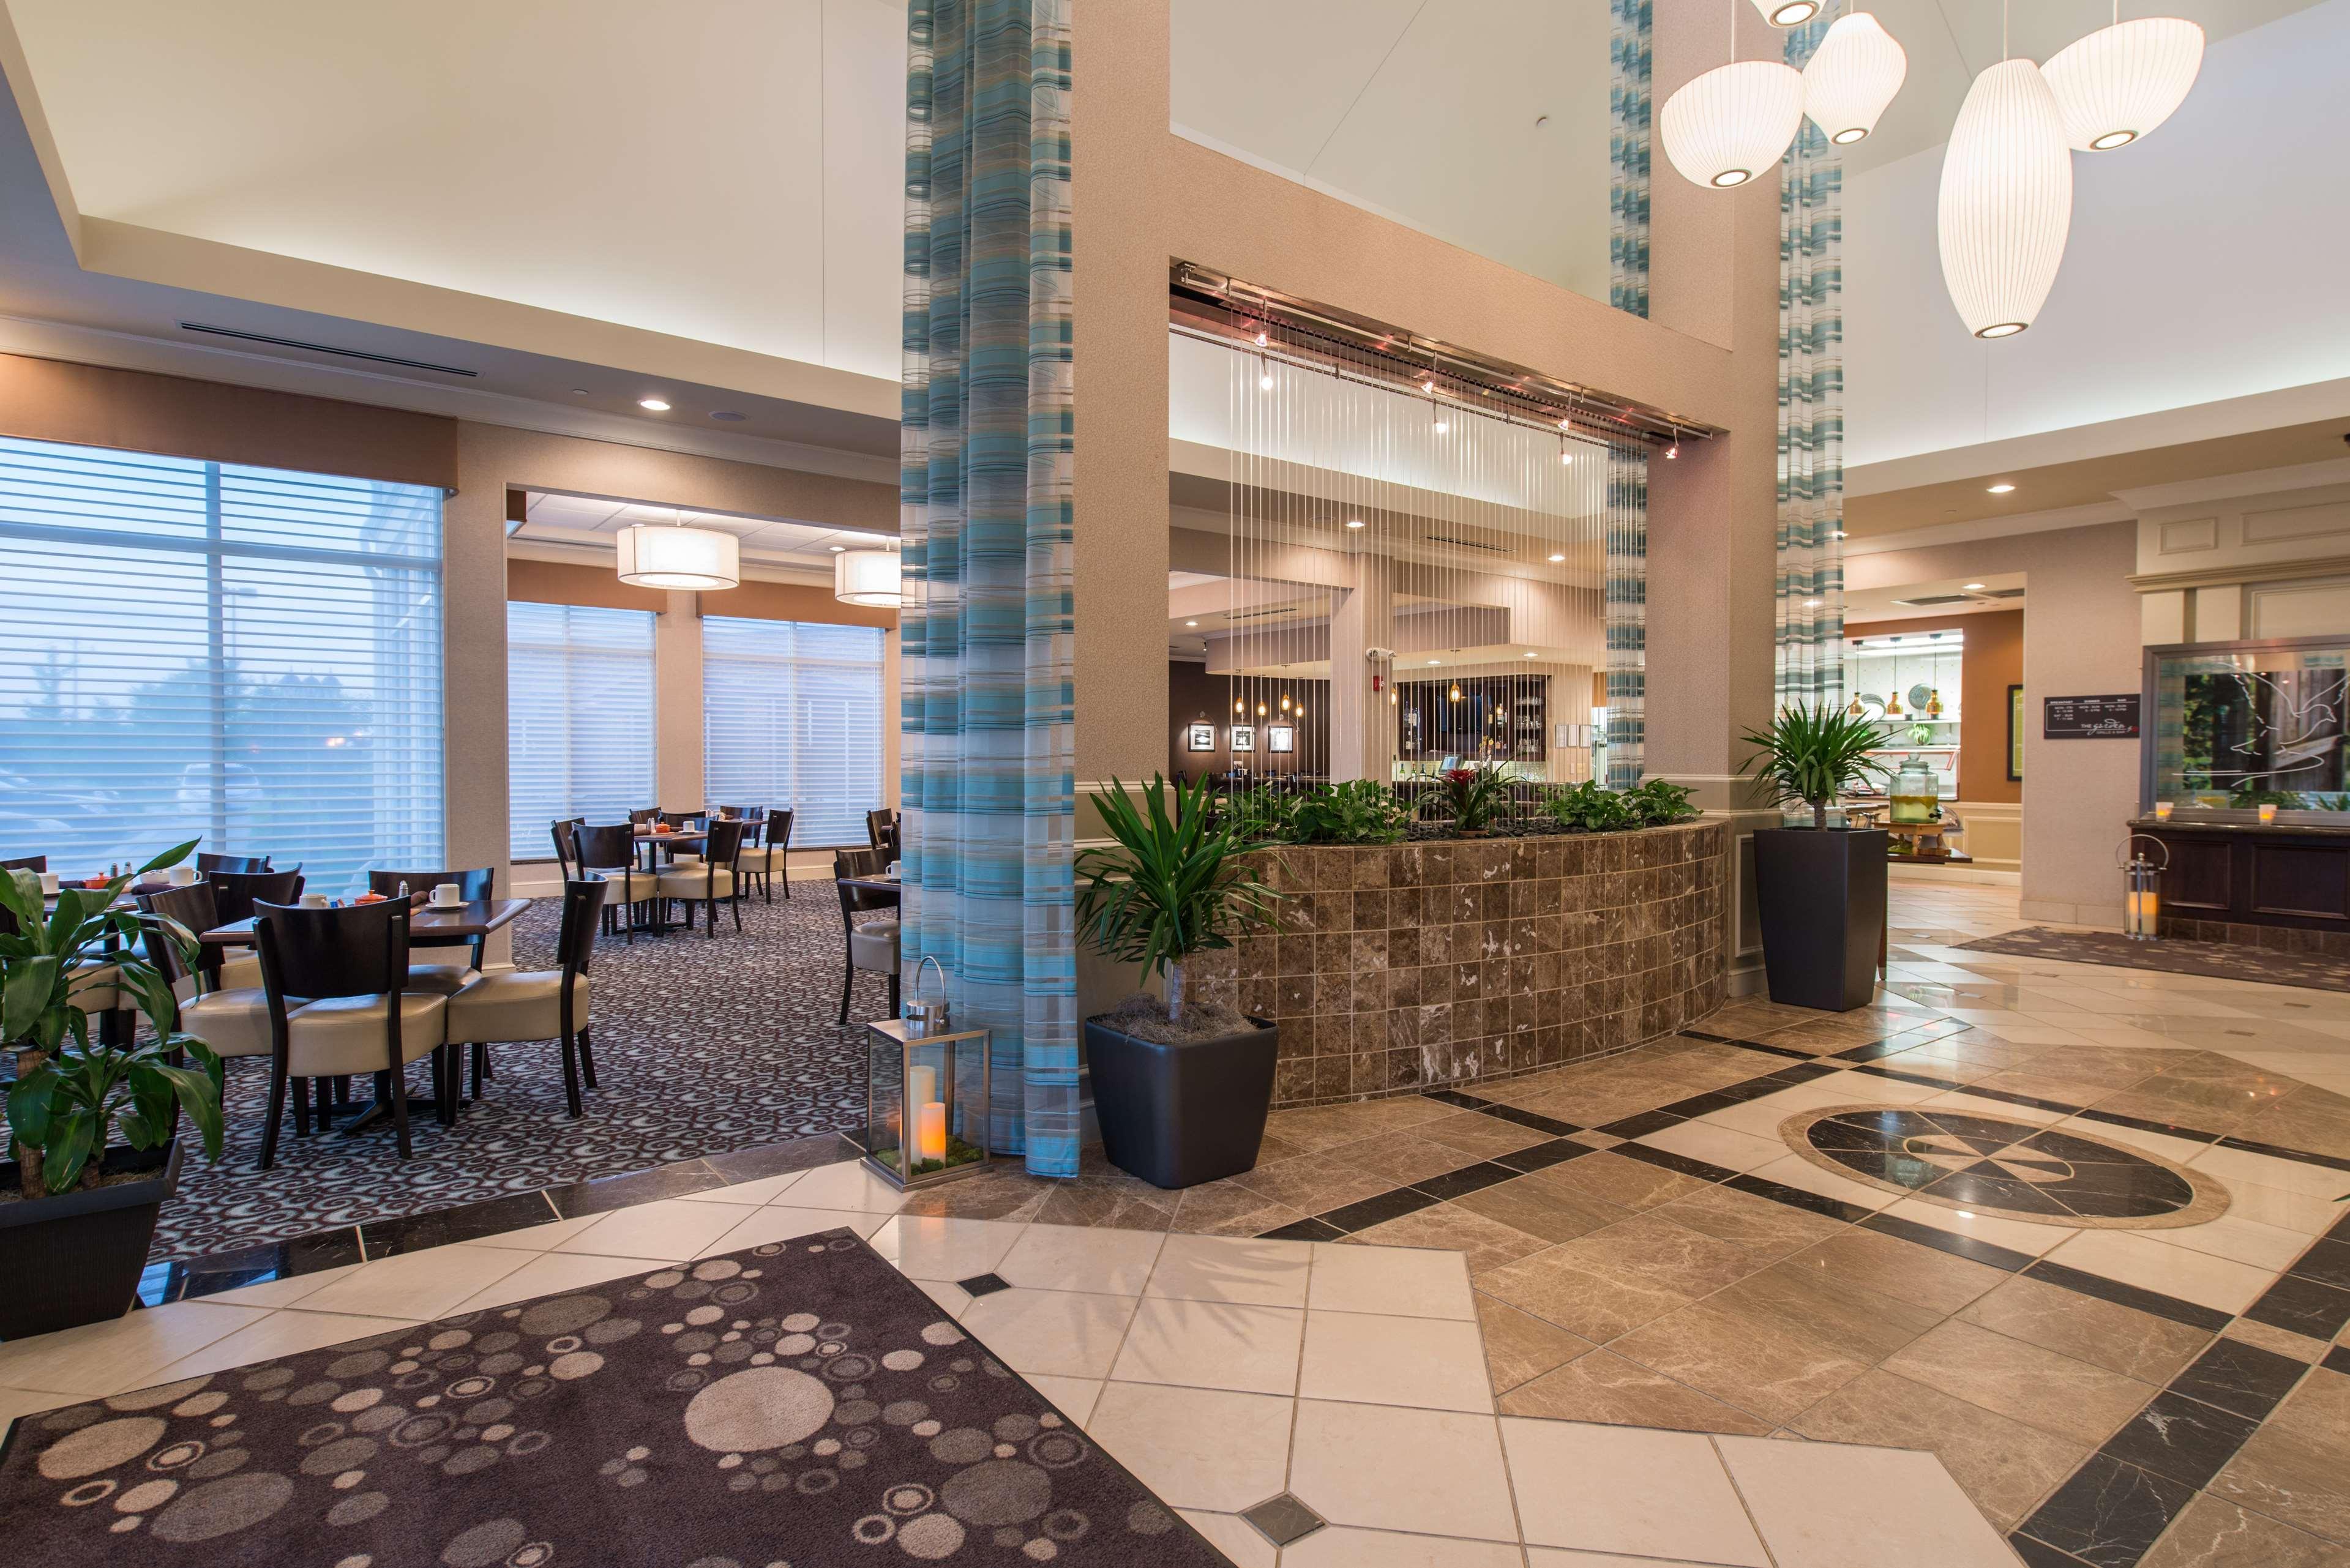 Hilton Garden Inn Lynchburg image 4